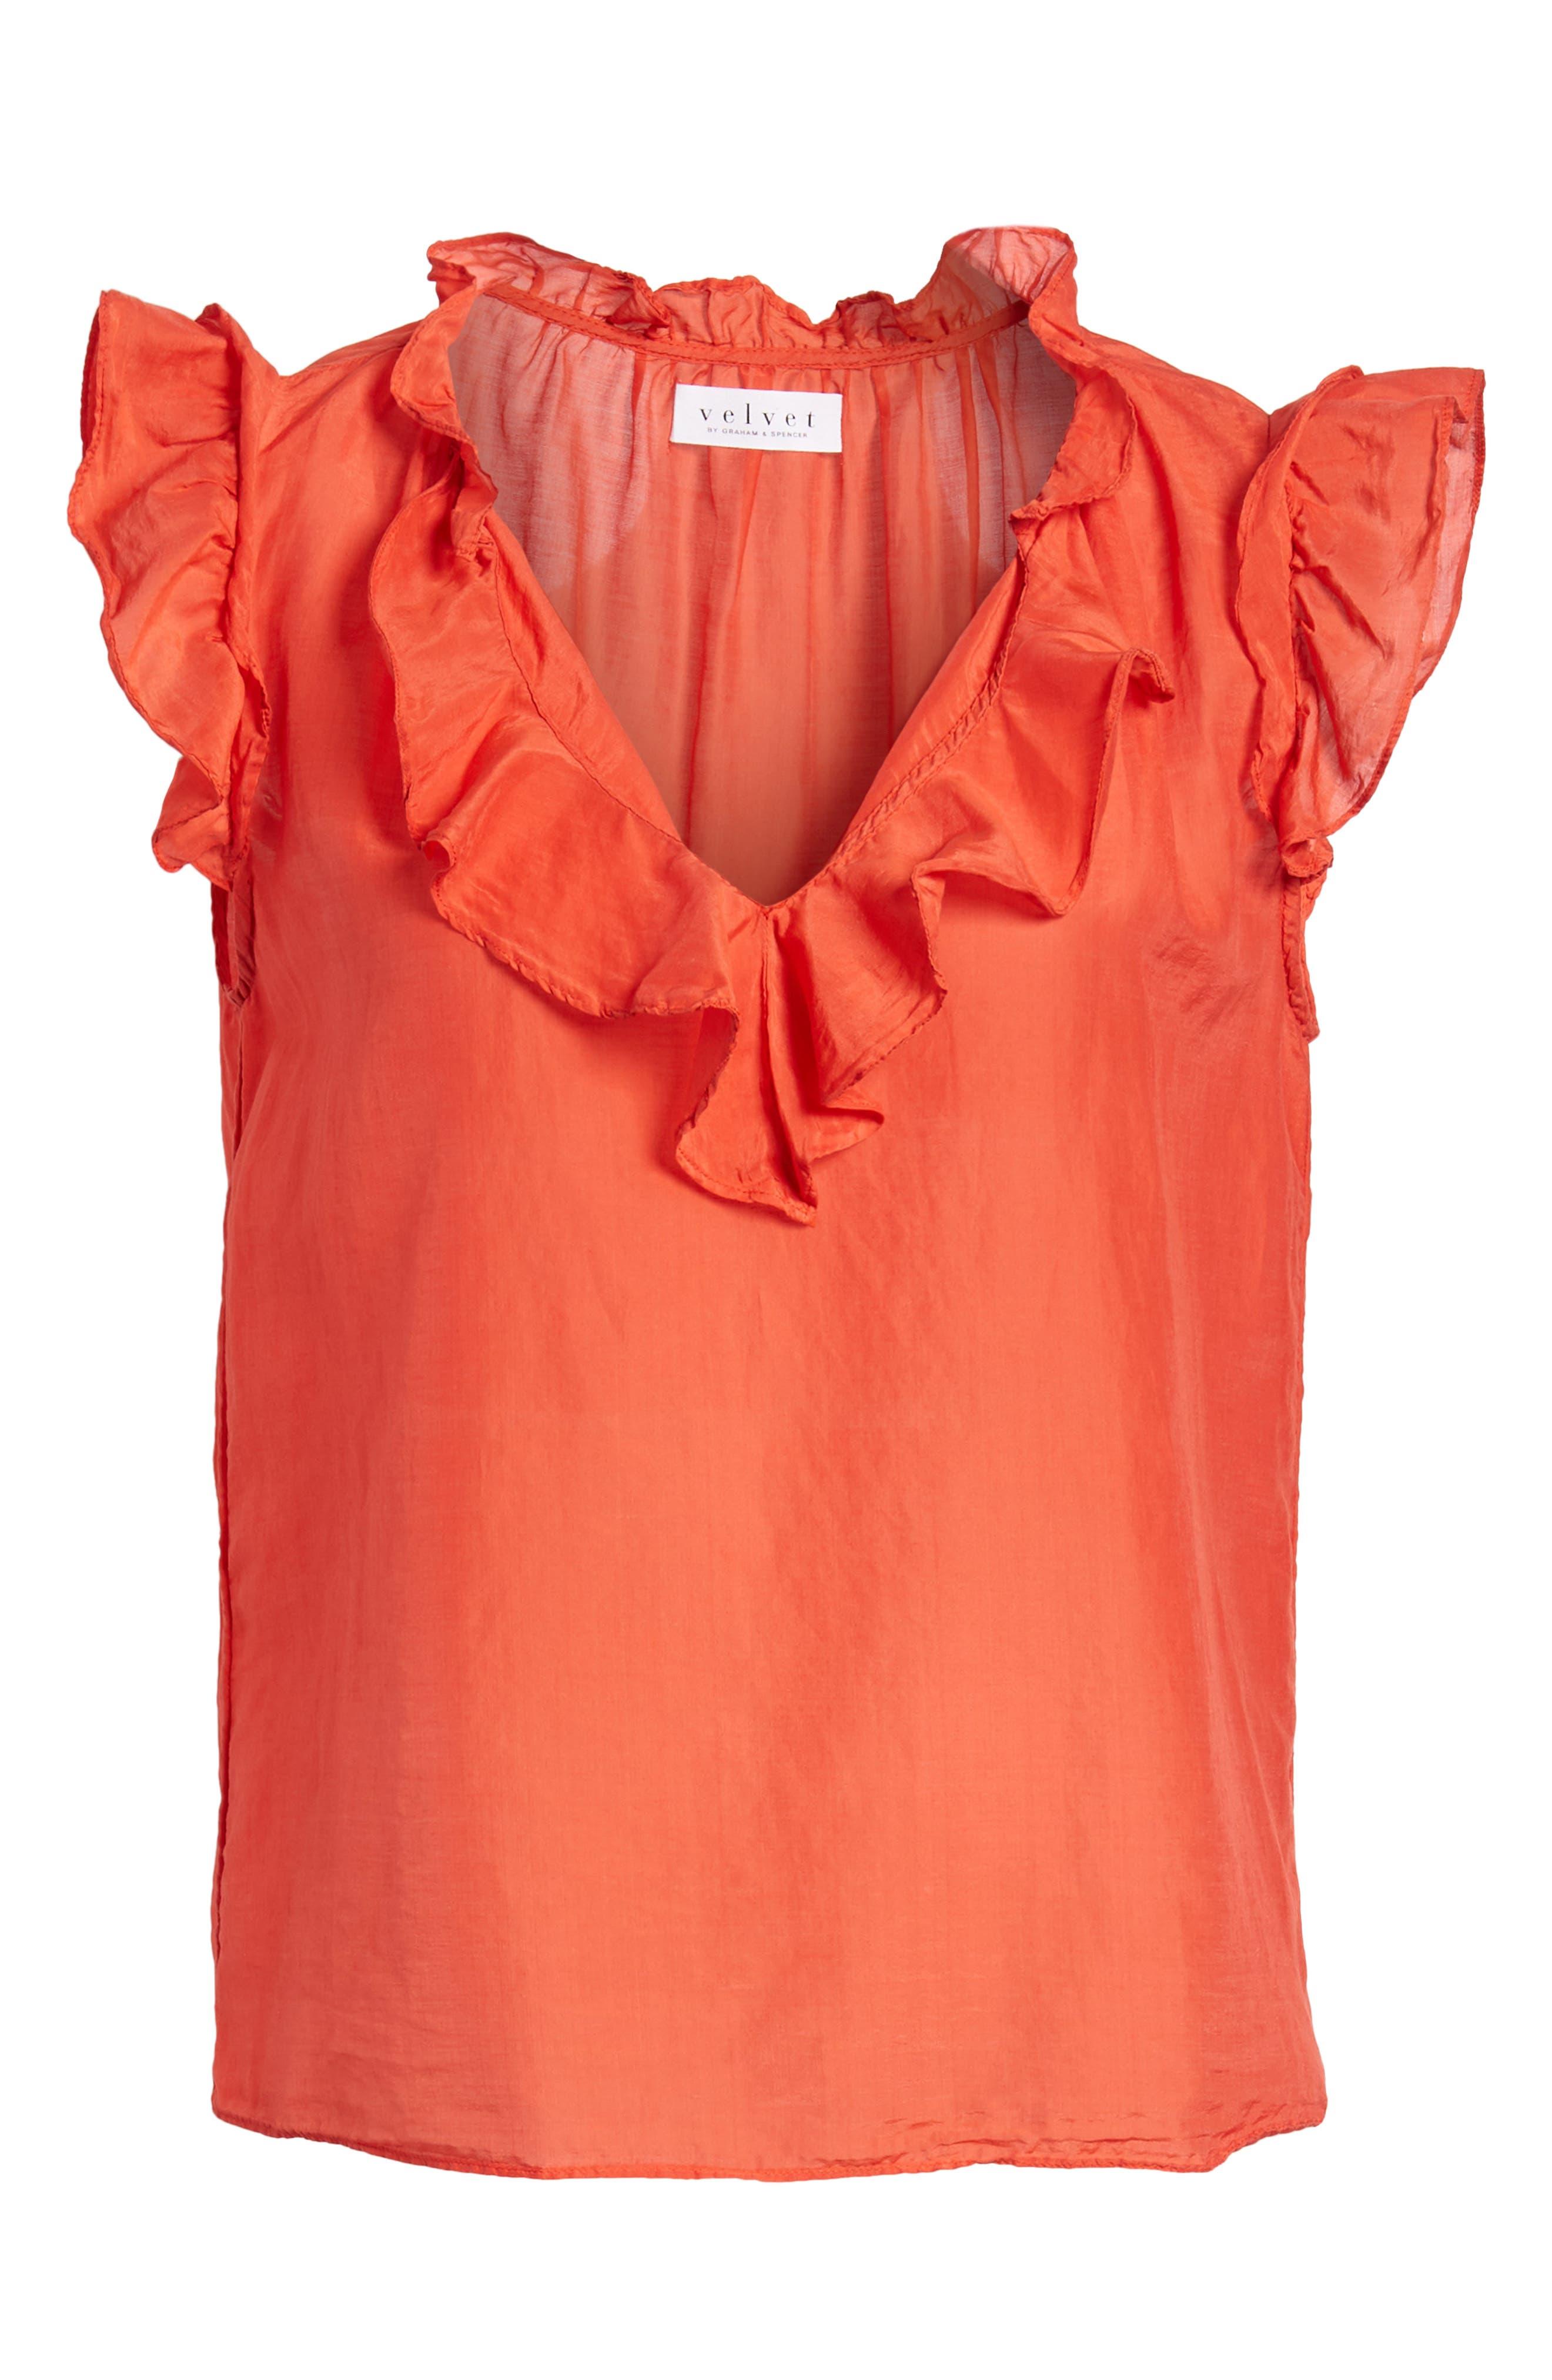 Silk and Cotton Ruffled Top,                             Alternate thumbnail 7, color,                             Cardinal